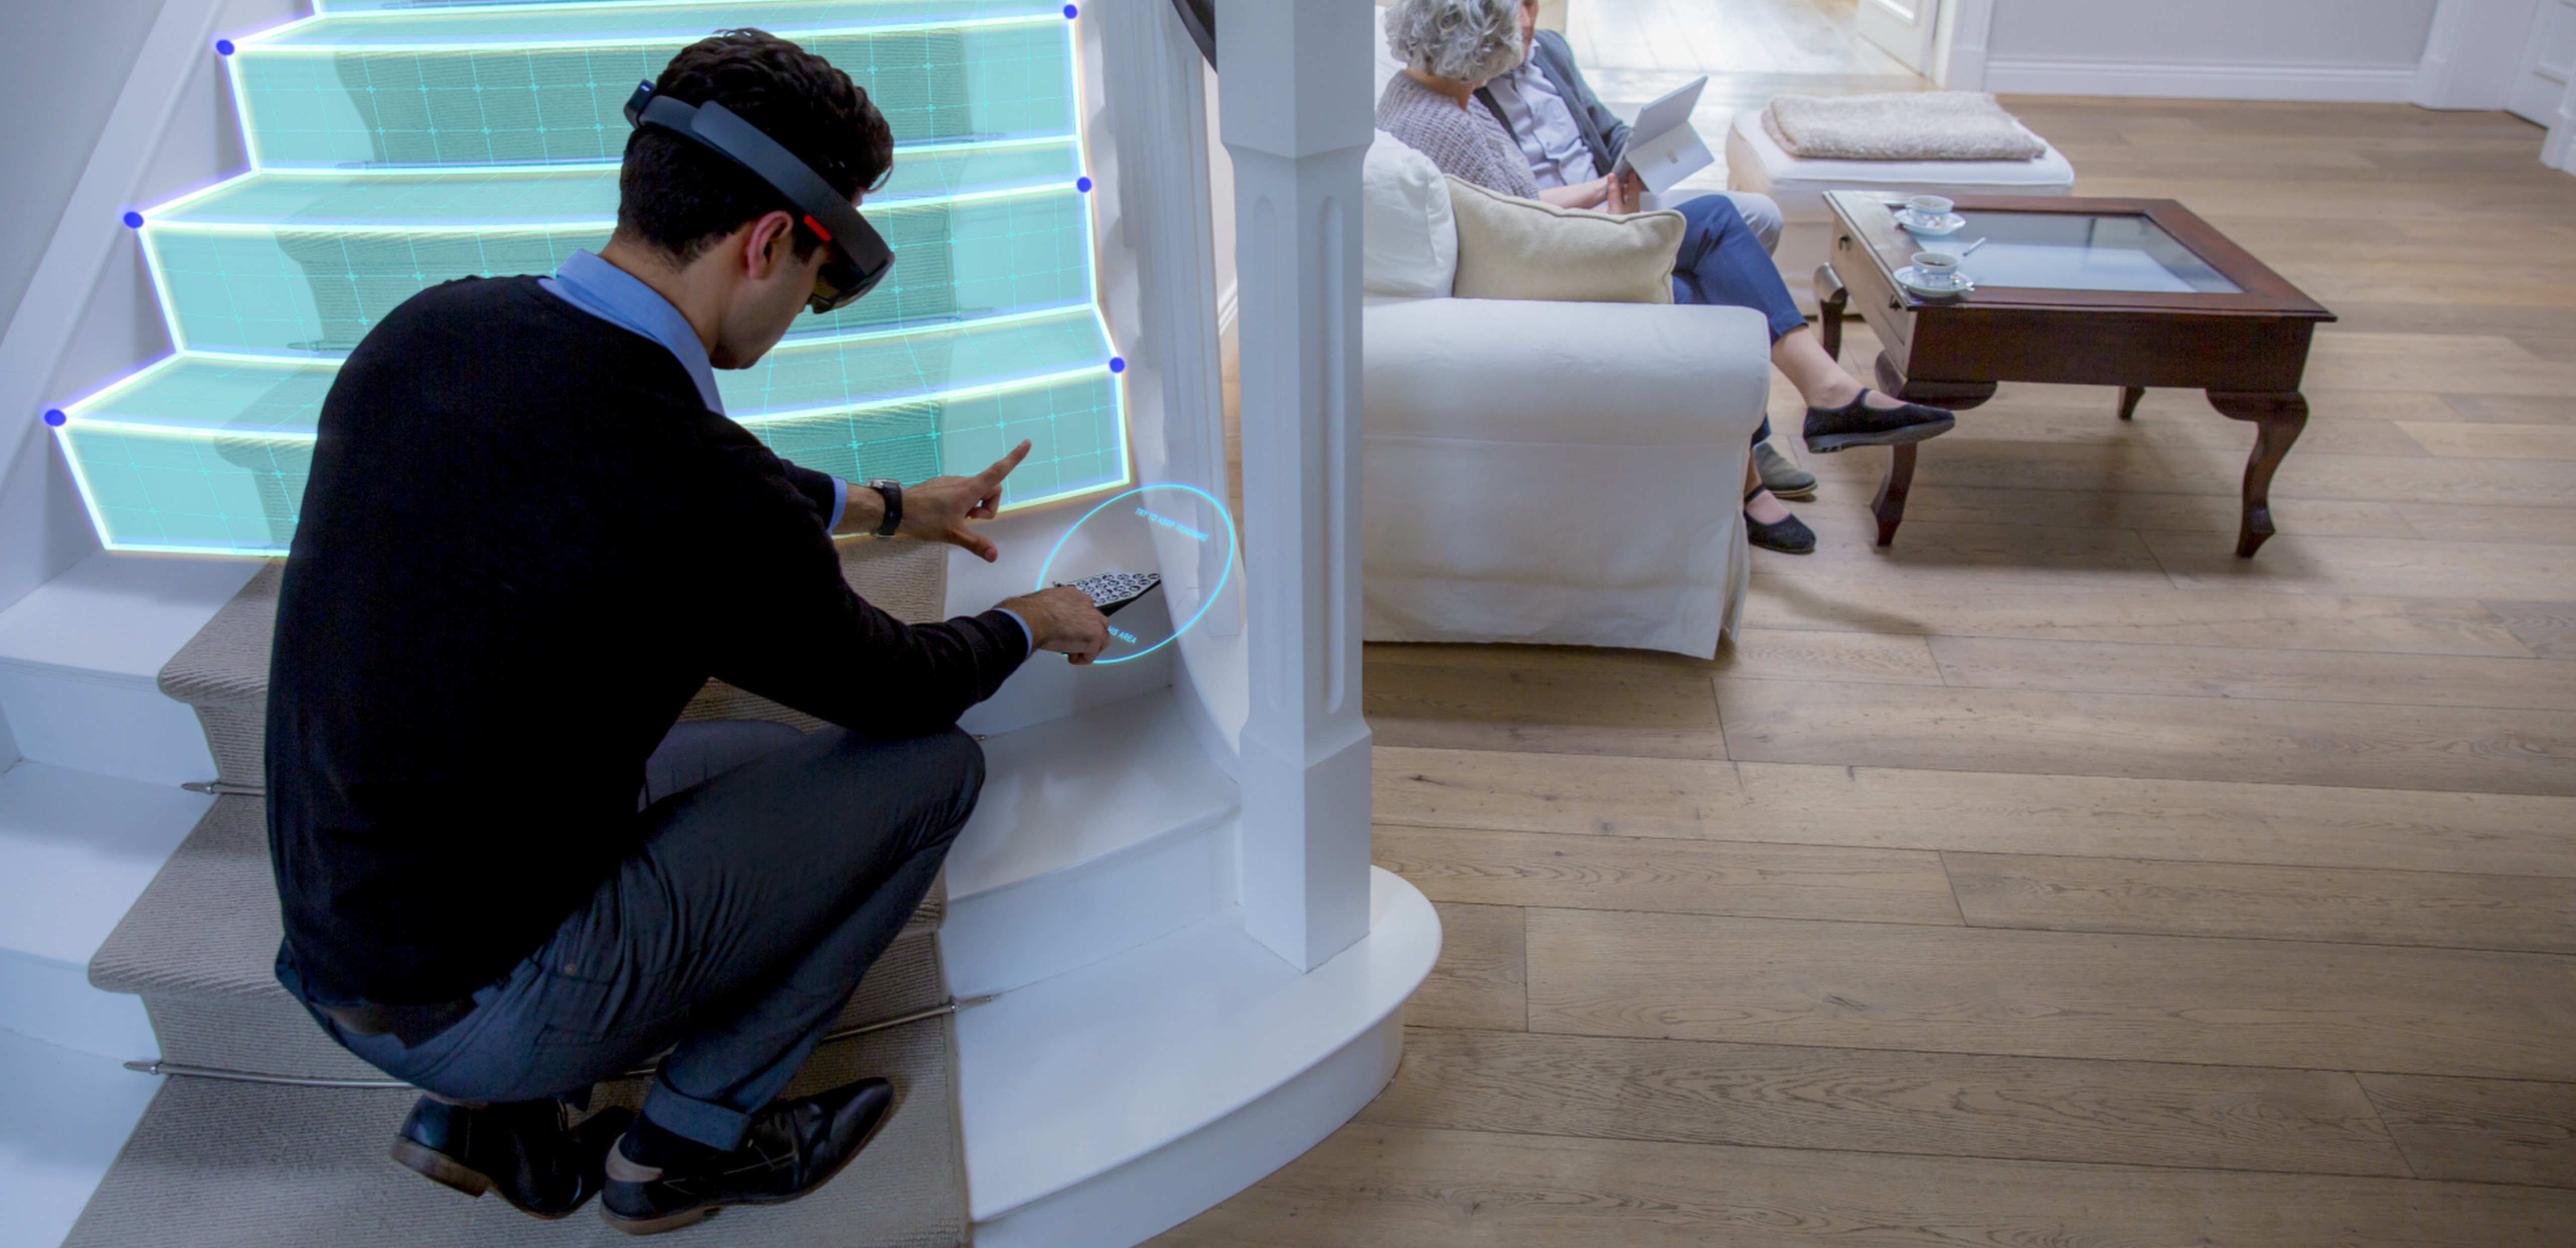 ThyssenKrupp uses HoloLens for integrated design